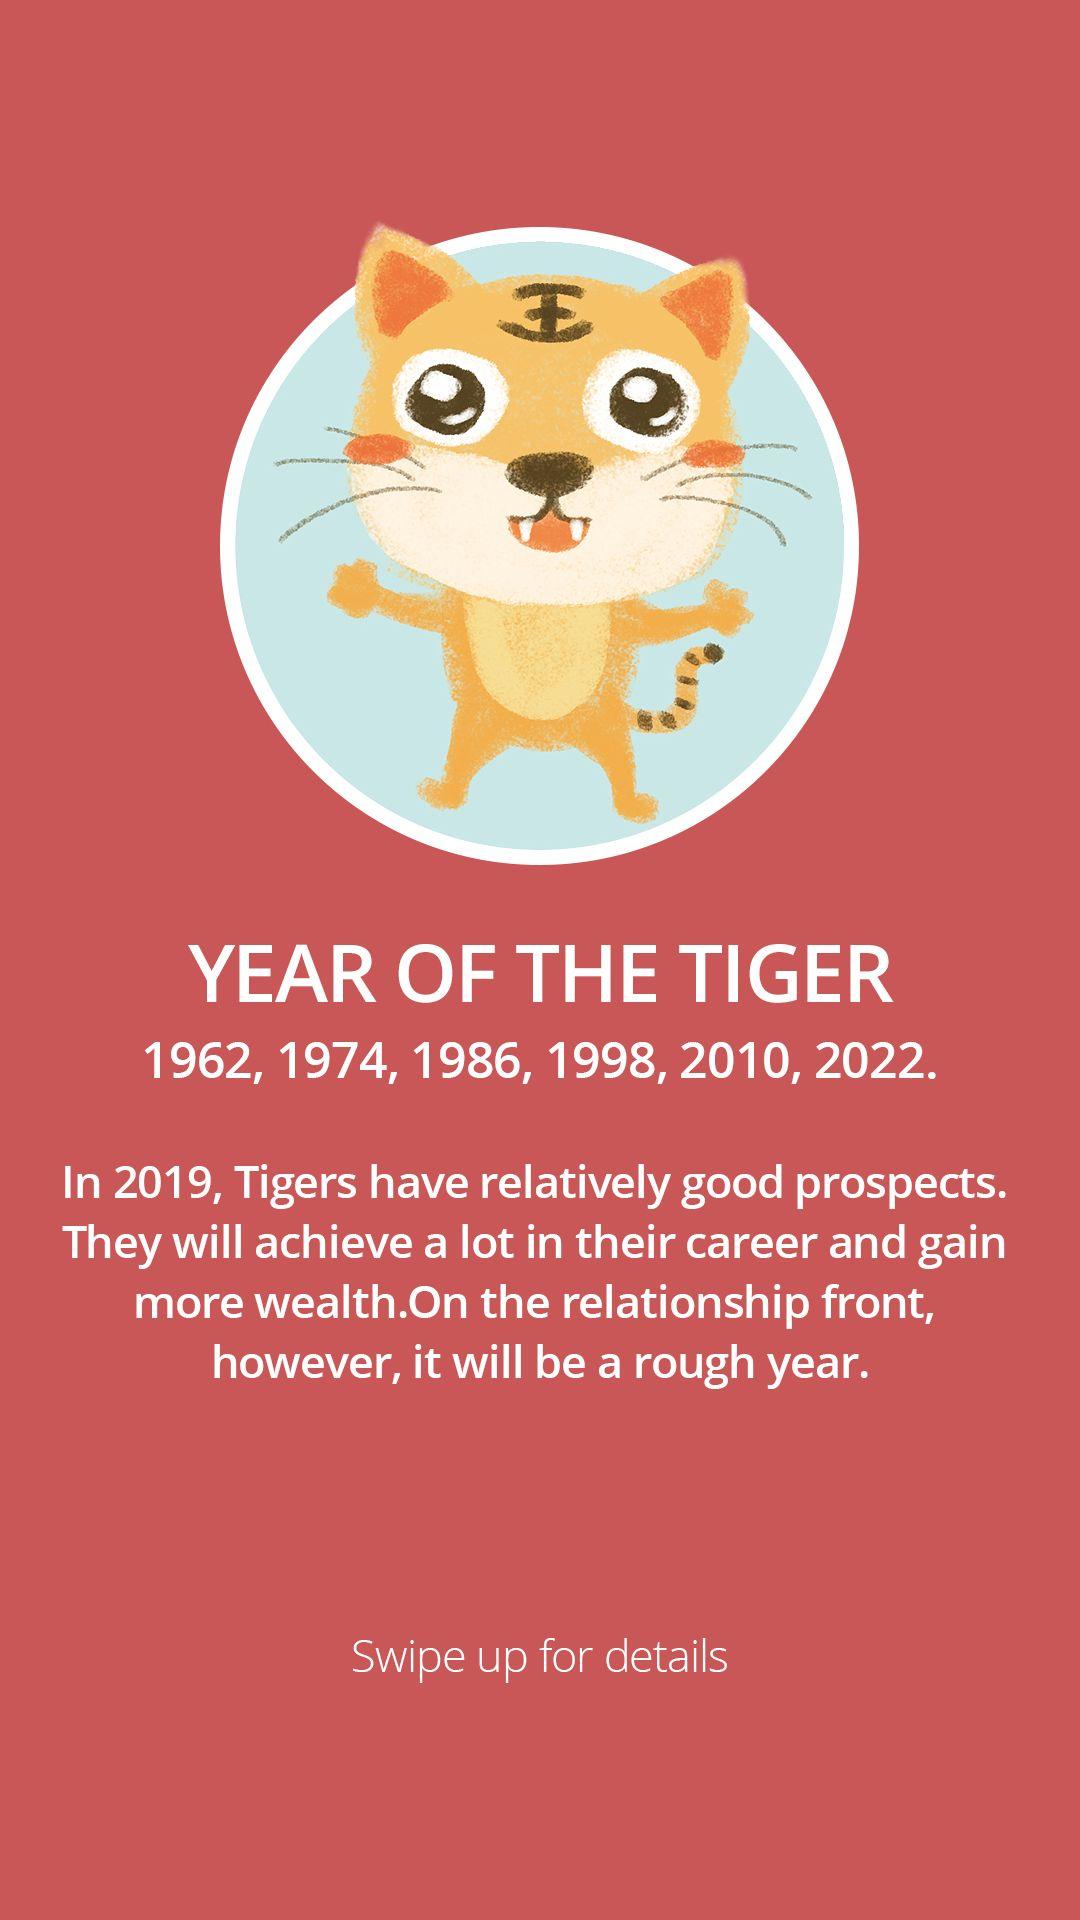 Year of the Tiger Year of the tiger, Tiger, Chinese